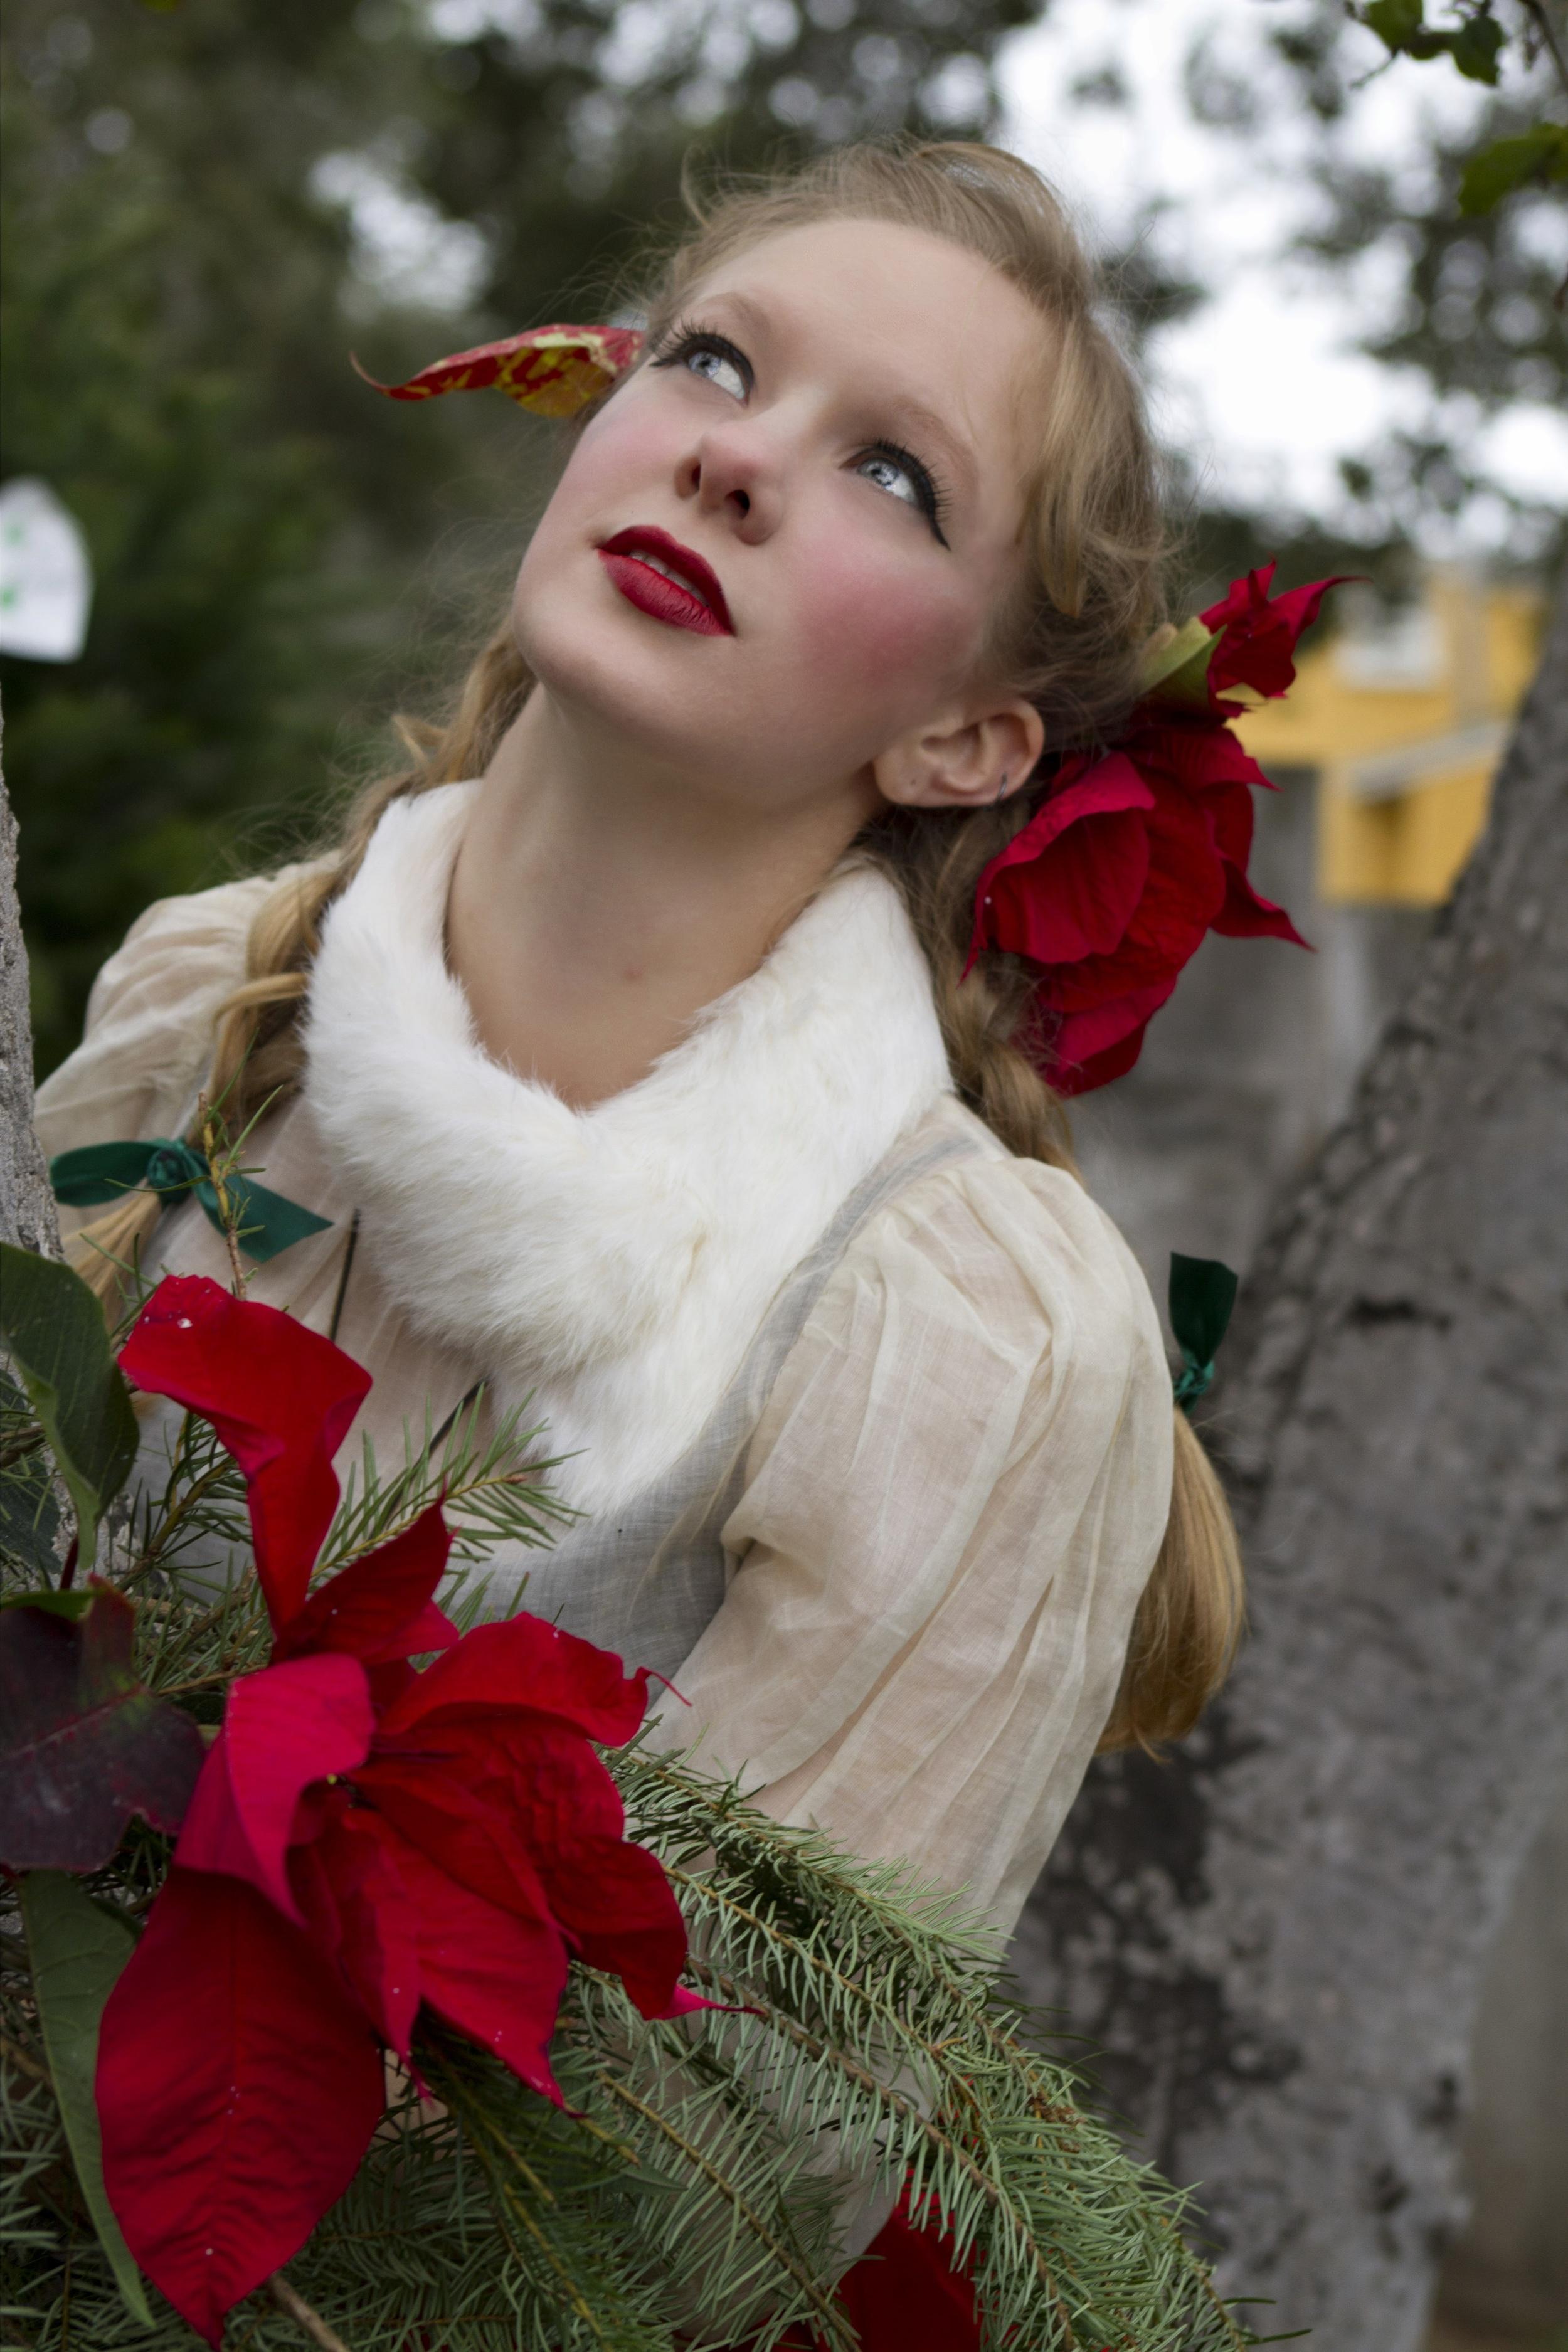 Poinsettia girl